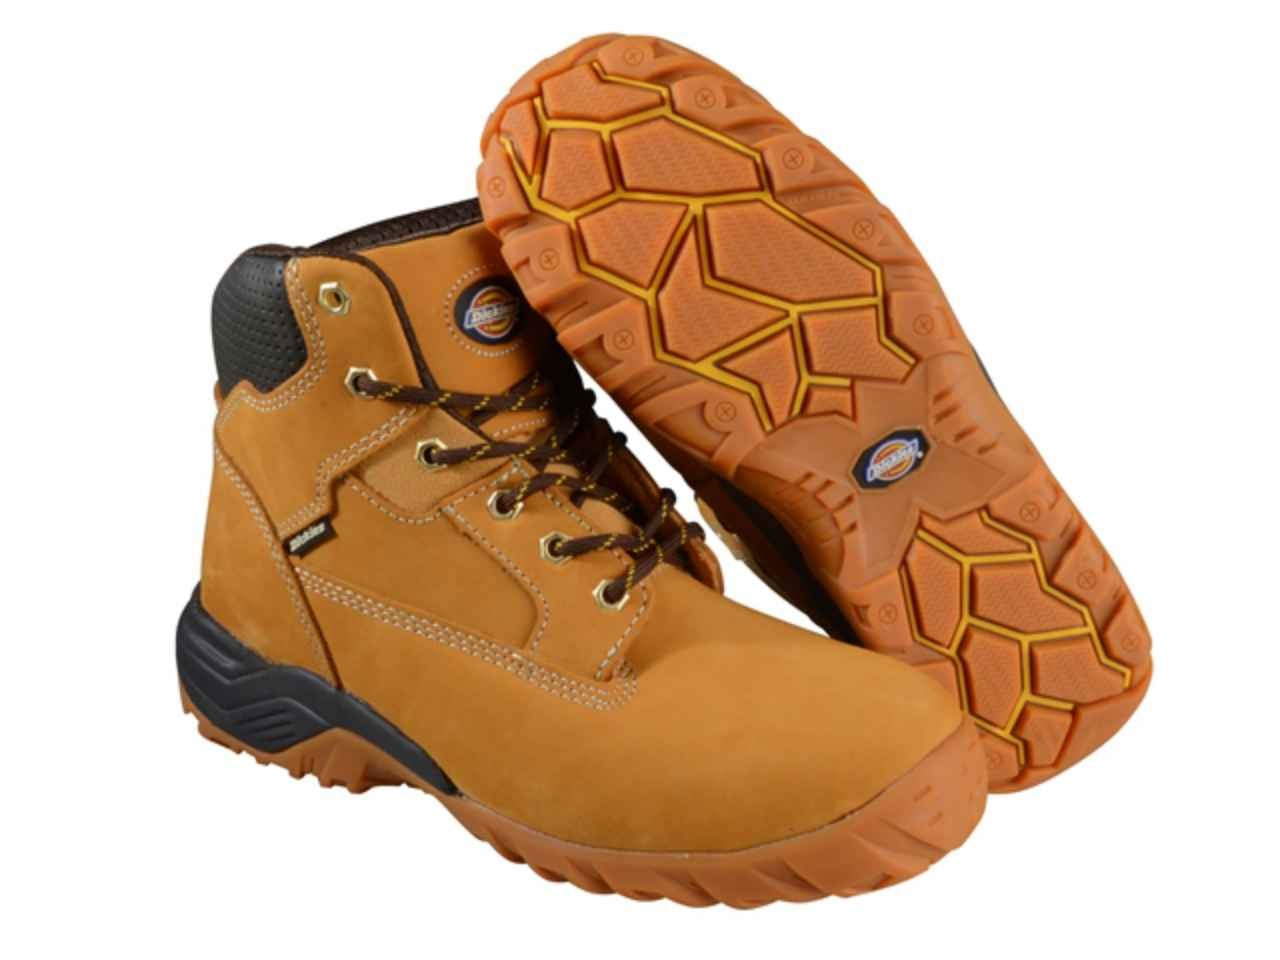 afa0504ec26 Dickies FD9207 9 Graton Safety Boot Honey Size 9